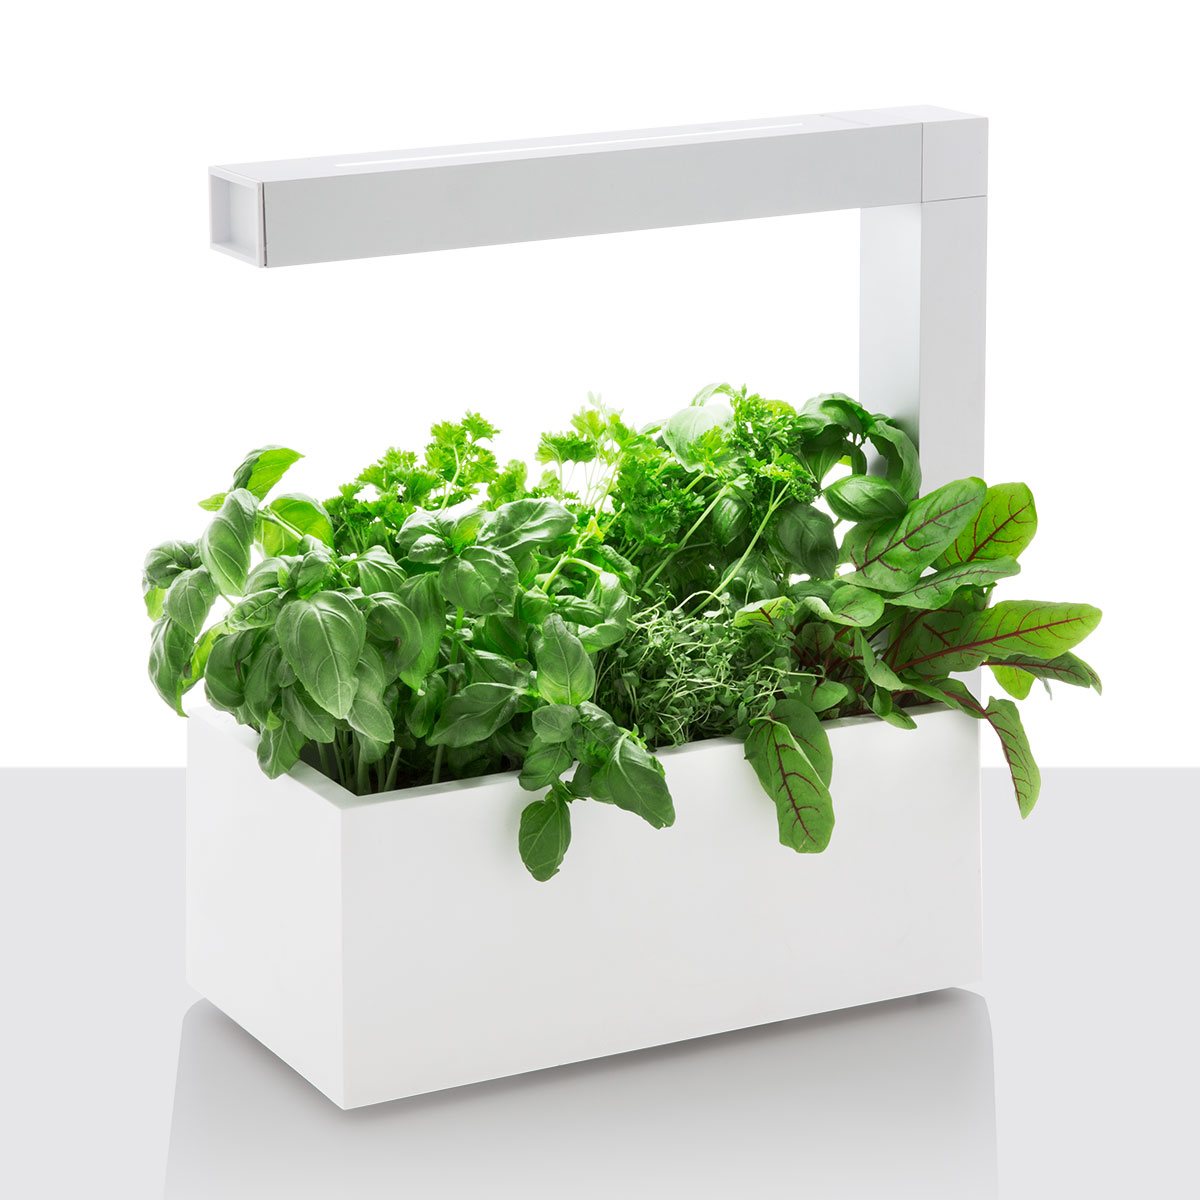 Billede af Tregren krydderurtepotte - Herbie Indoor Garden - White